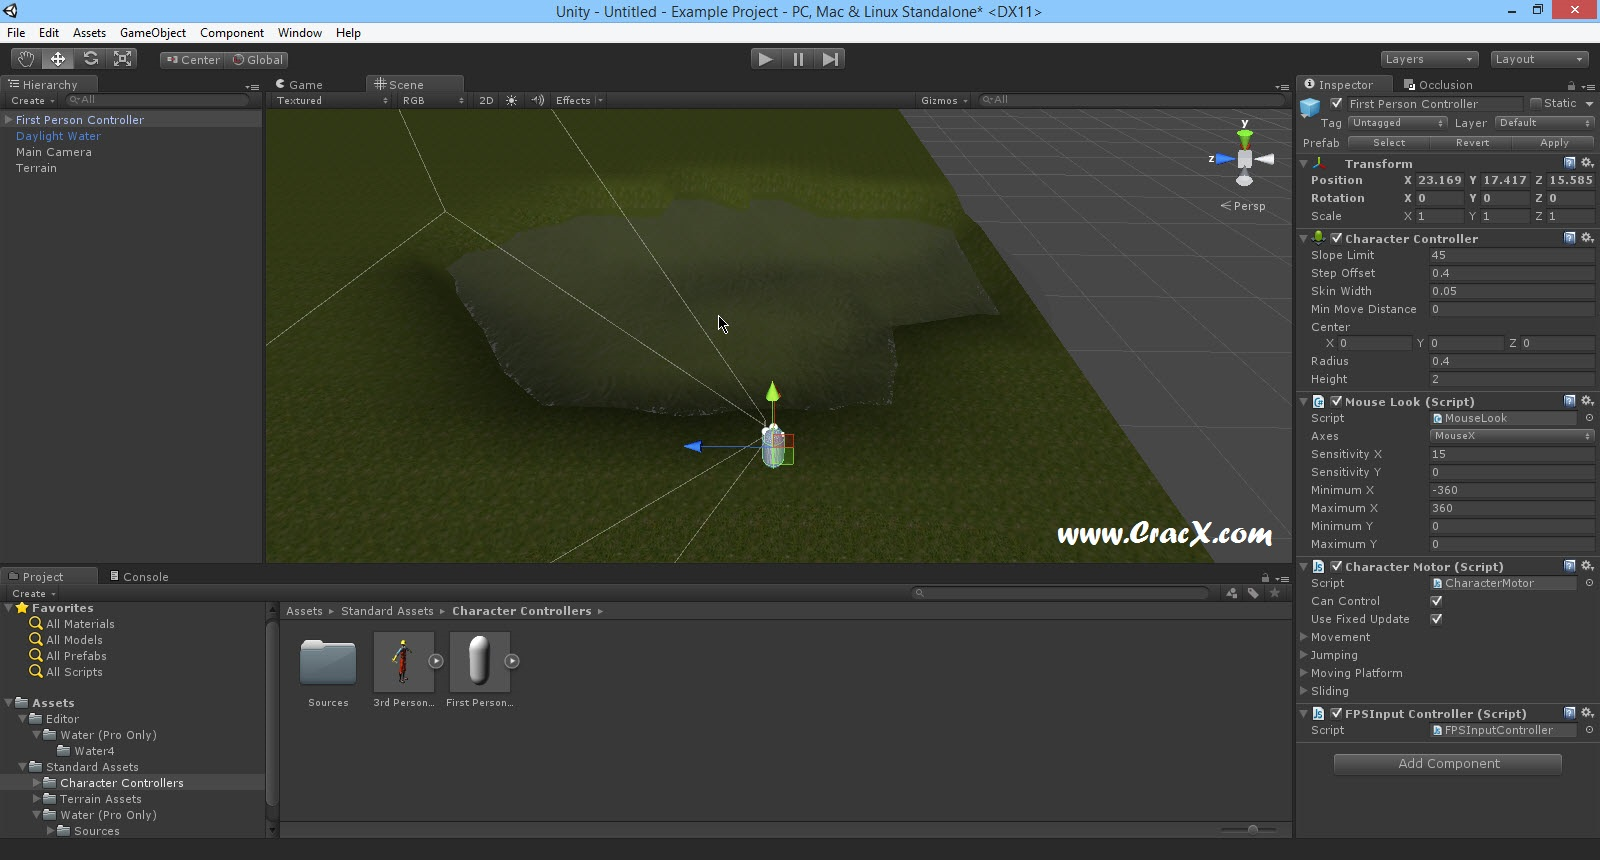 Unity3D Pro License Key 5 Crack Keygen Full Free Download